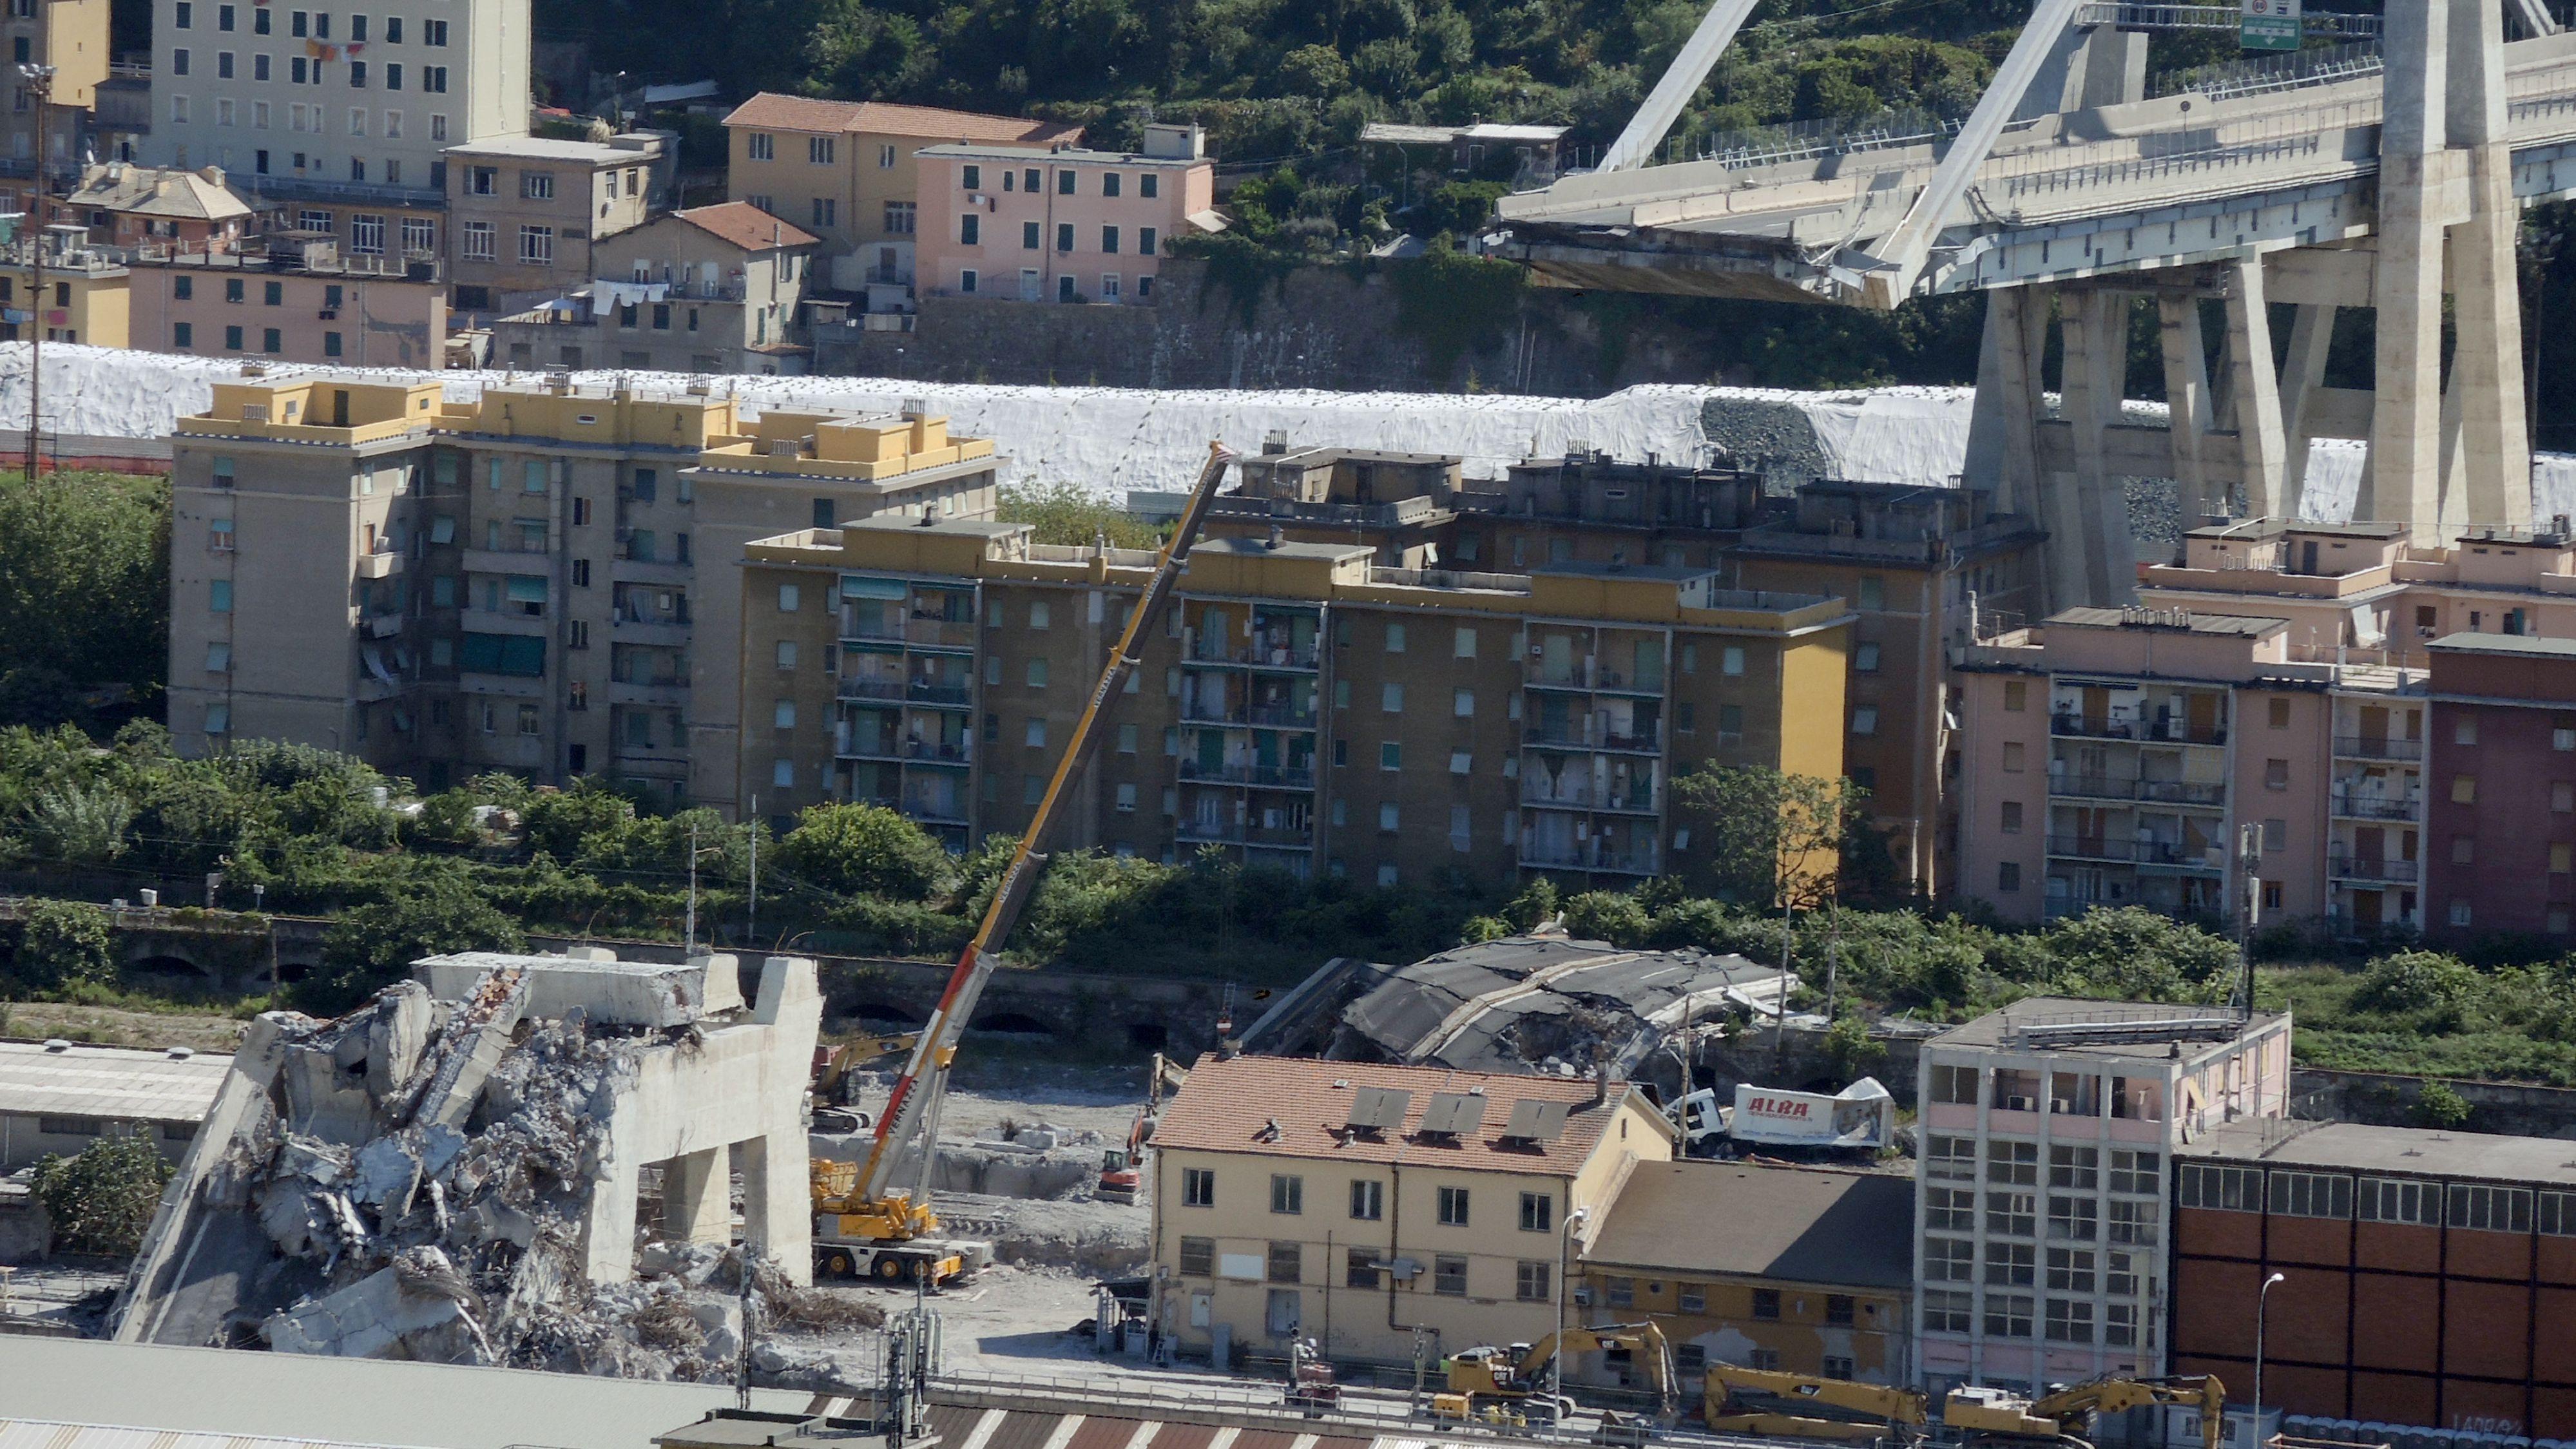 Die eingestürzte Ponte Morandi in Genua.